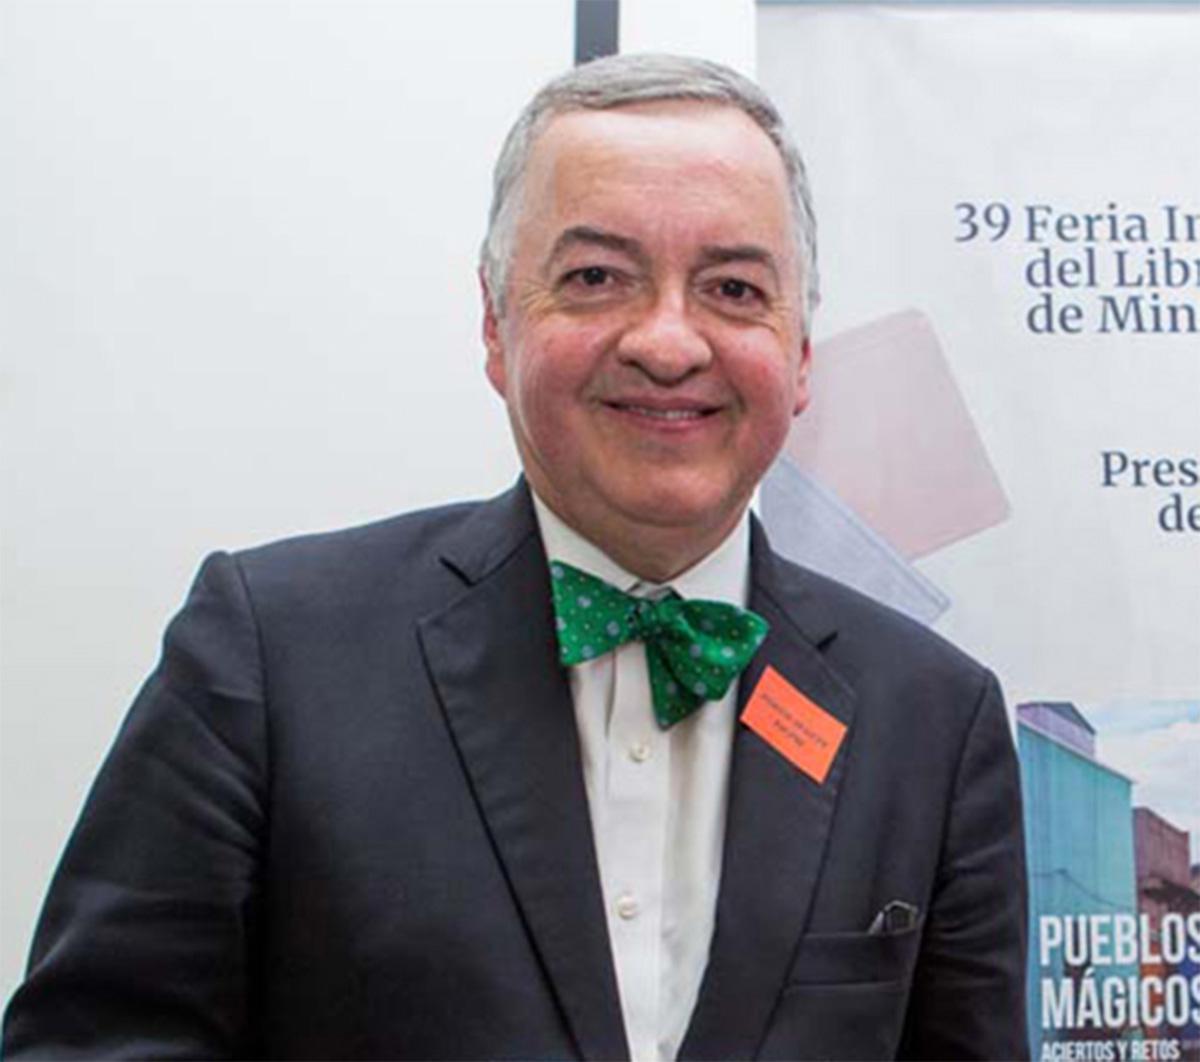 TURISMO ANTES DESPUÉS PANDEMIA METRO 04